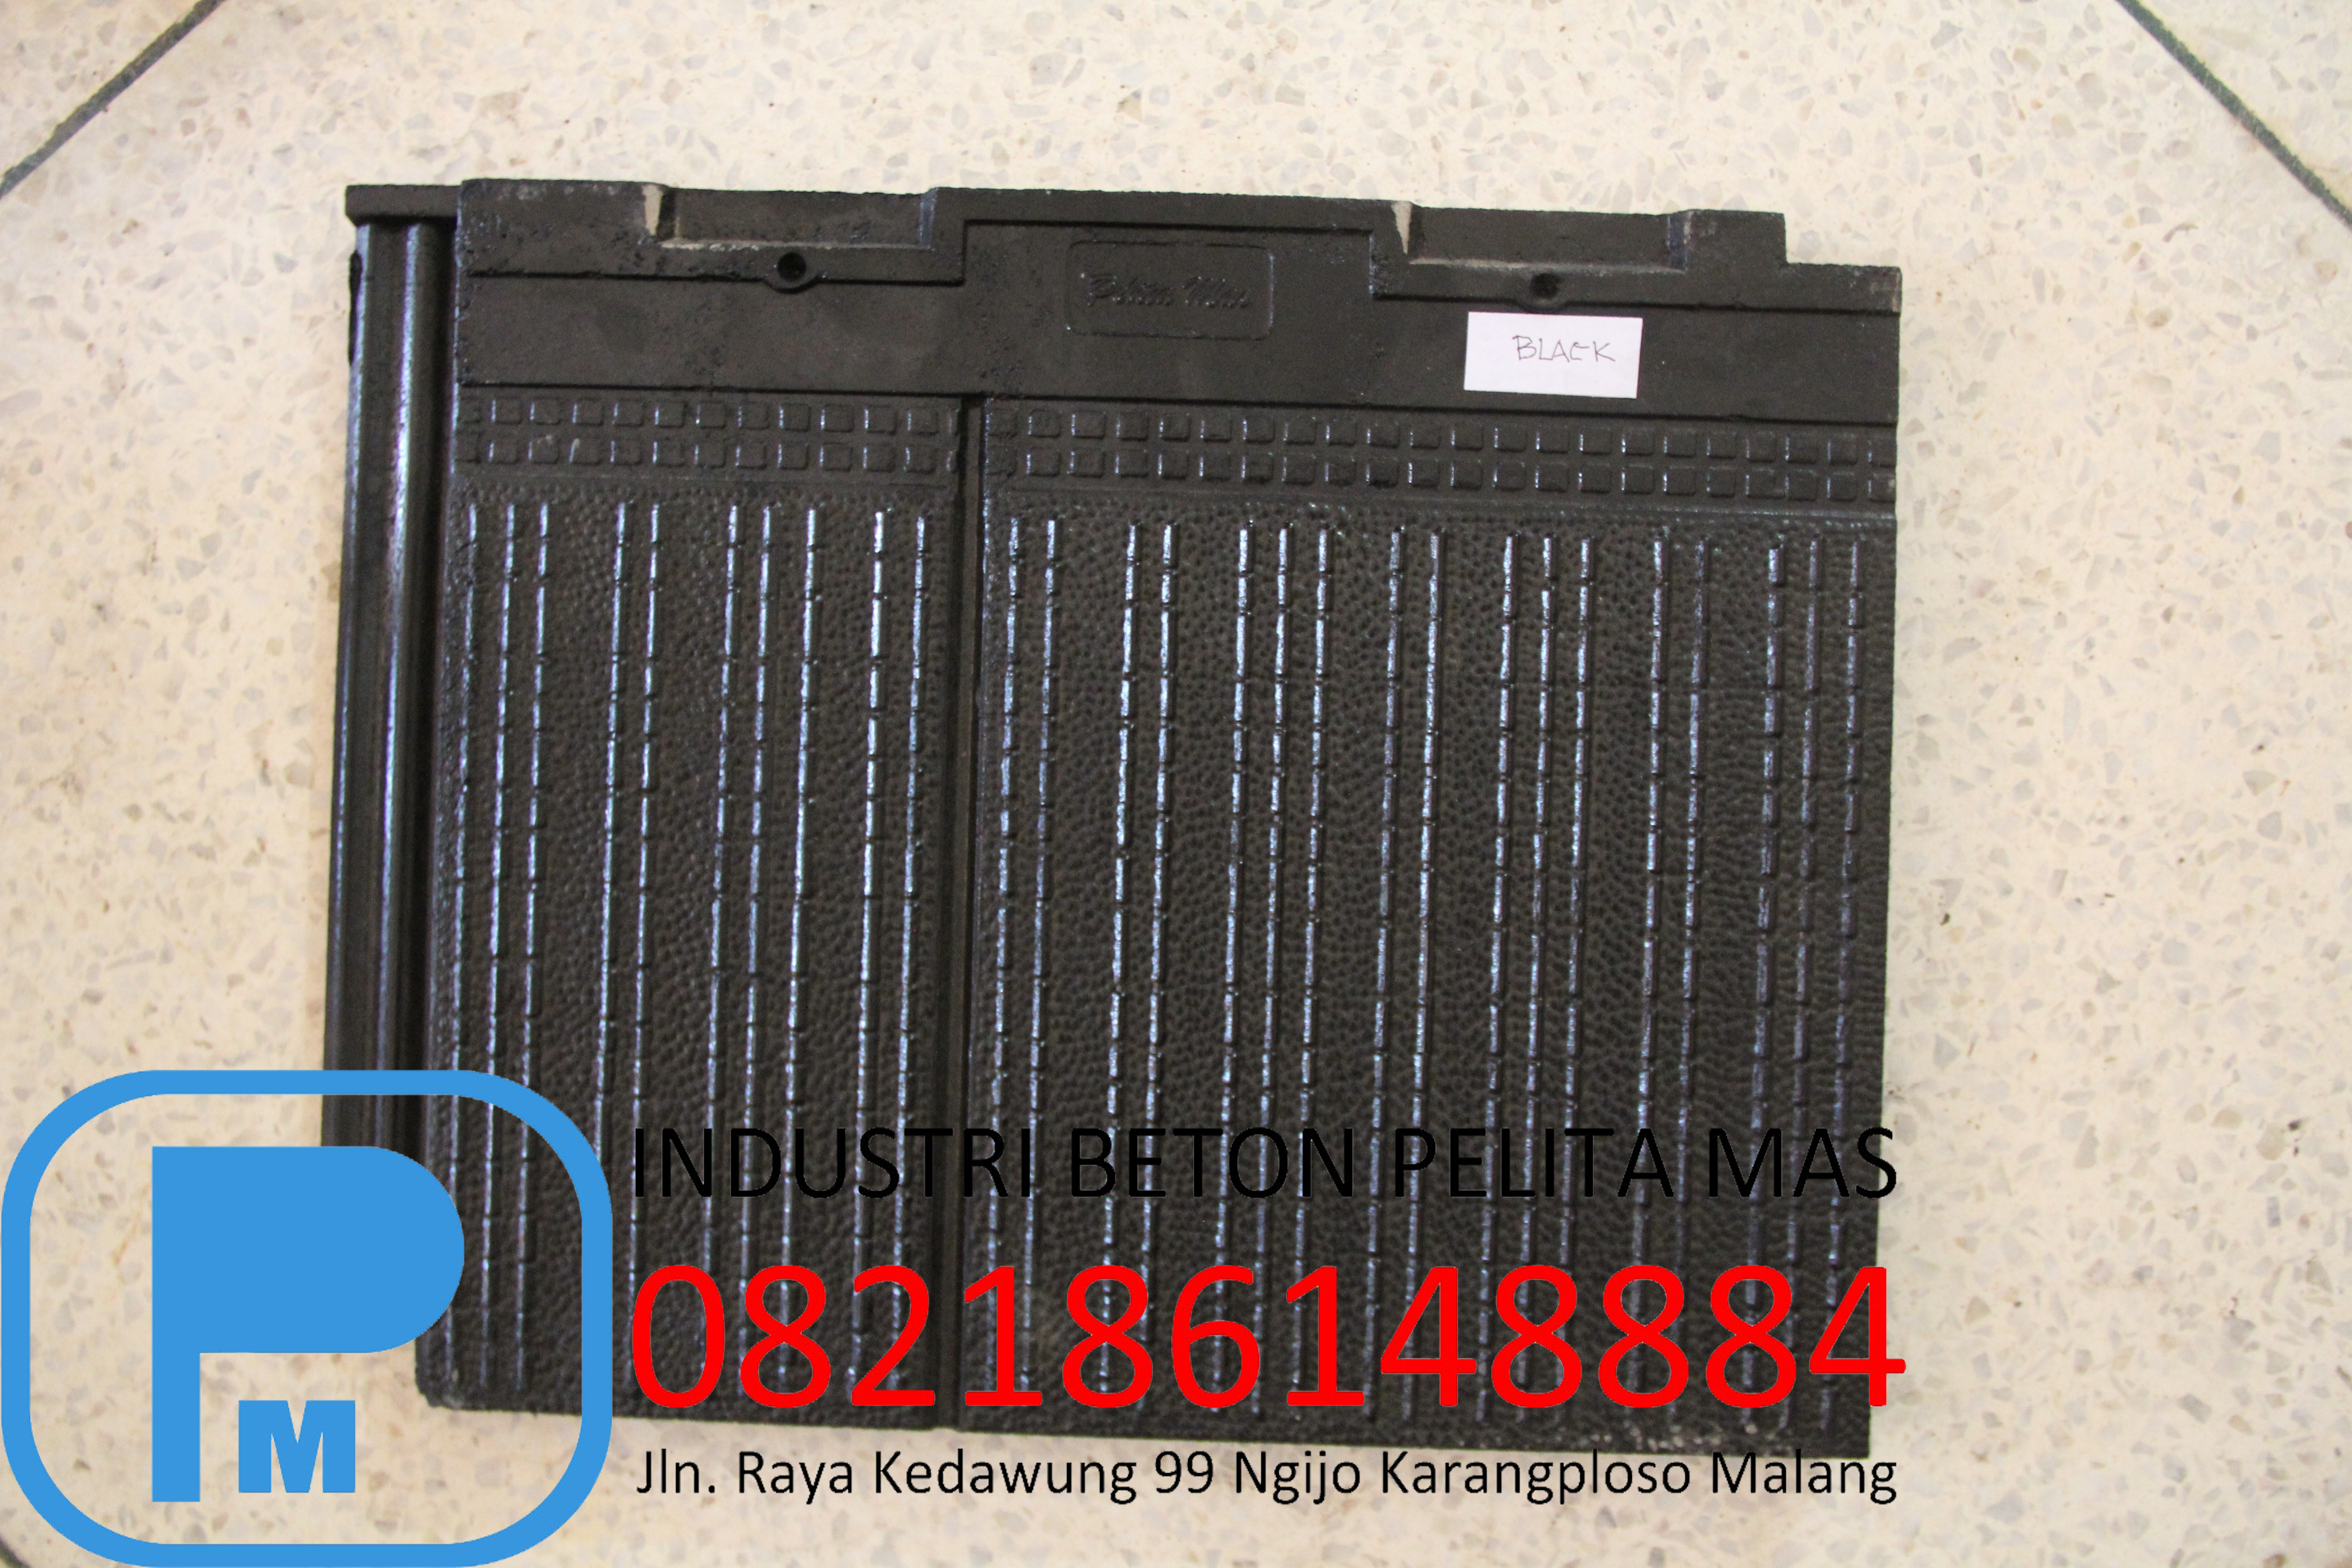 HP/WA 0821-8614-8884, Jual Genteng Surabaya